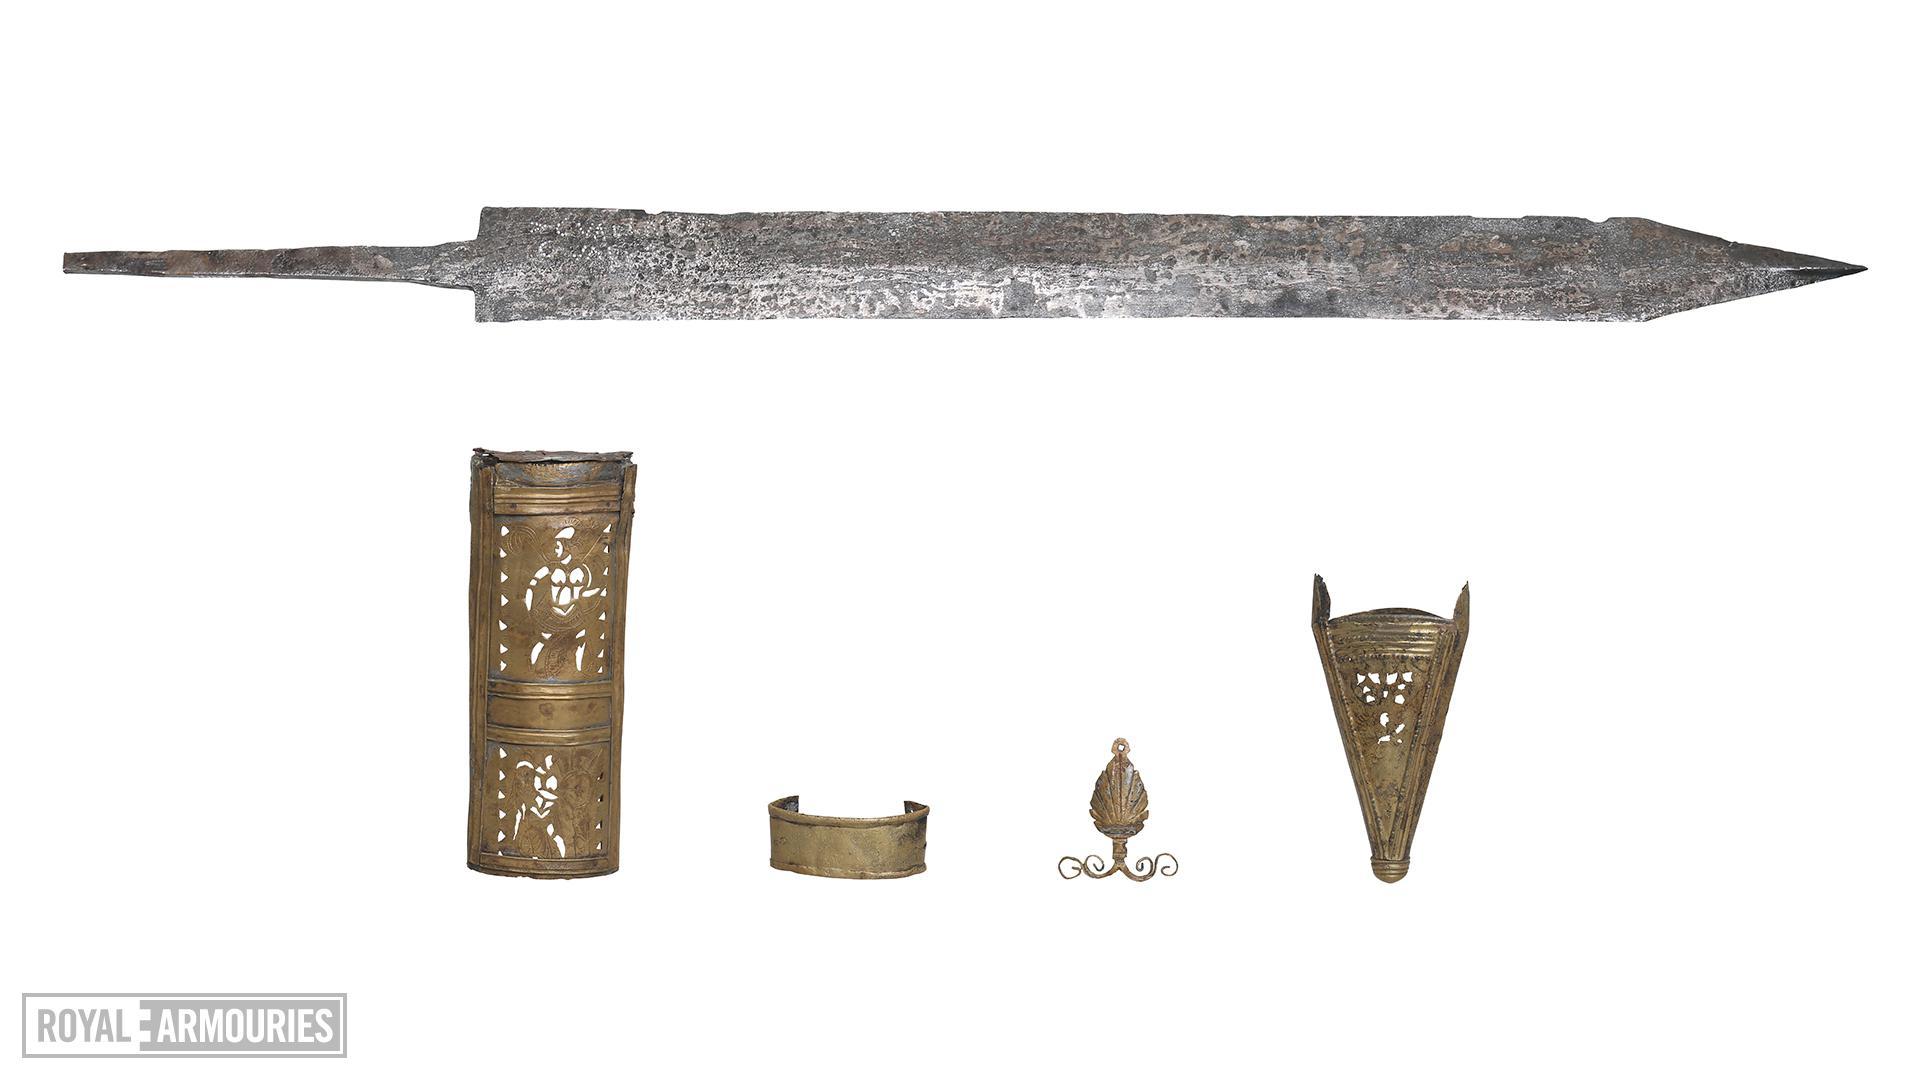 Gladius and scabbard mounts - of the 'Pompeii' type